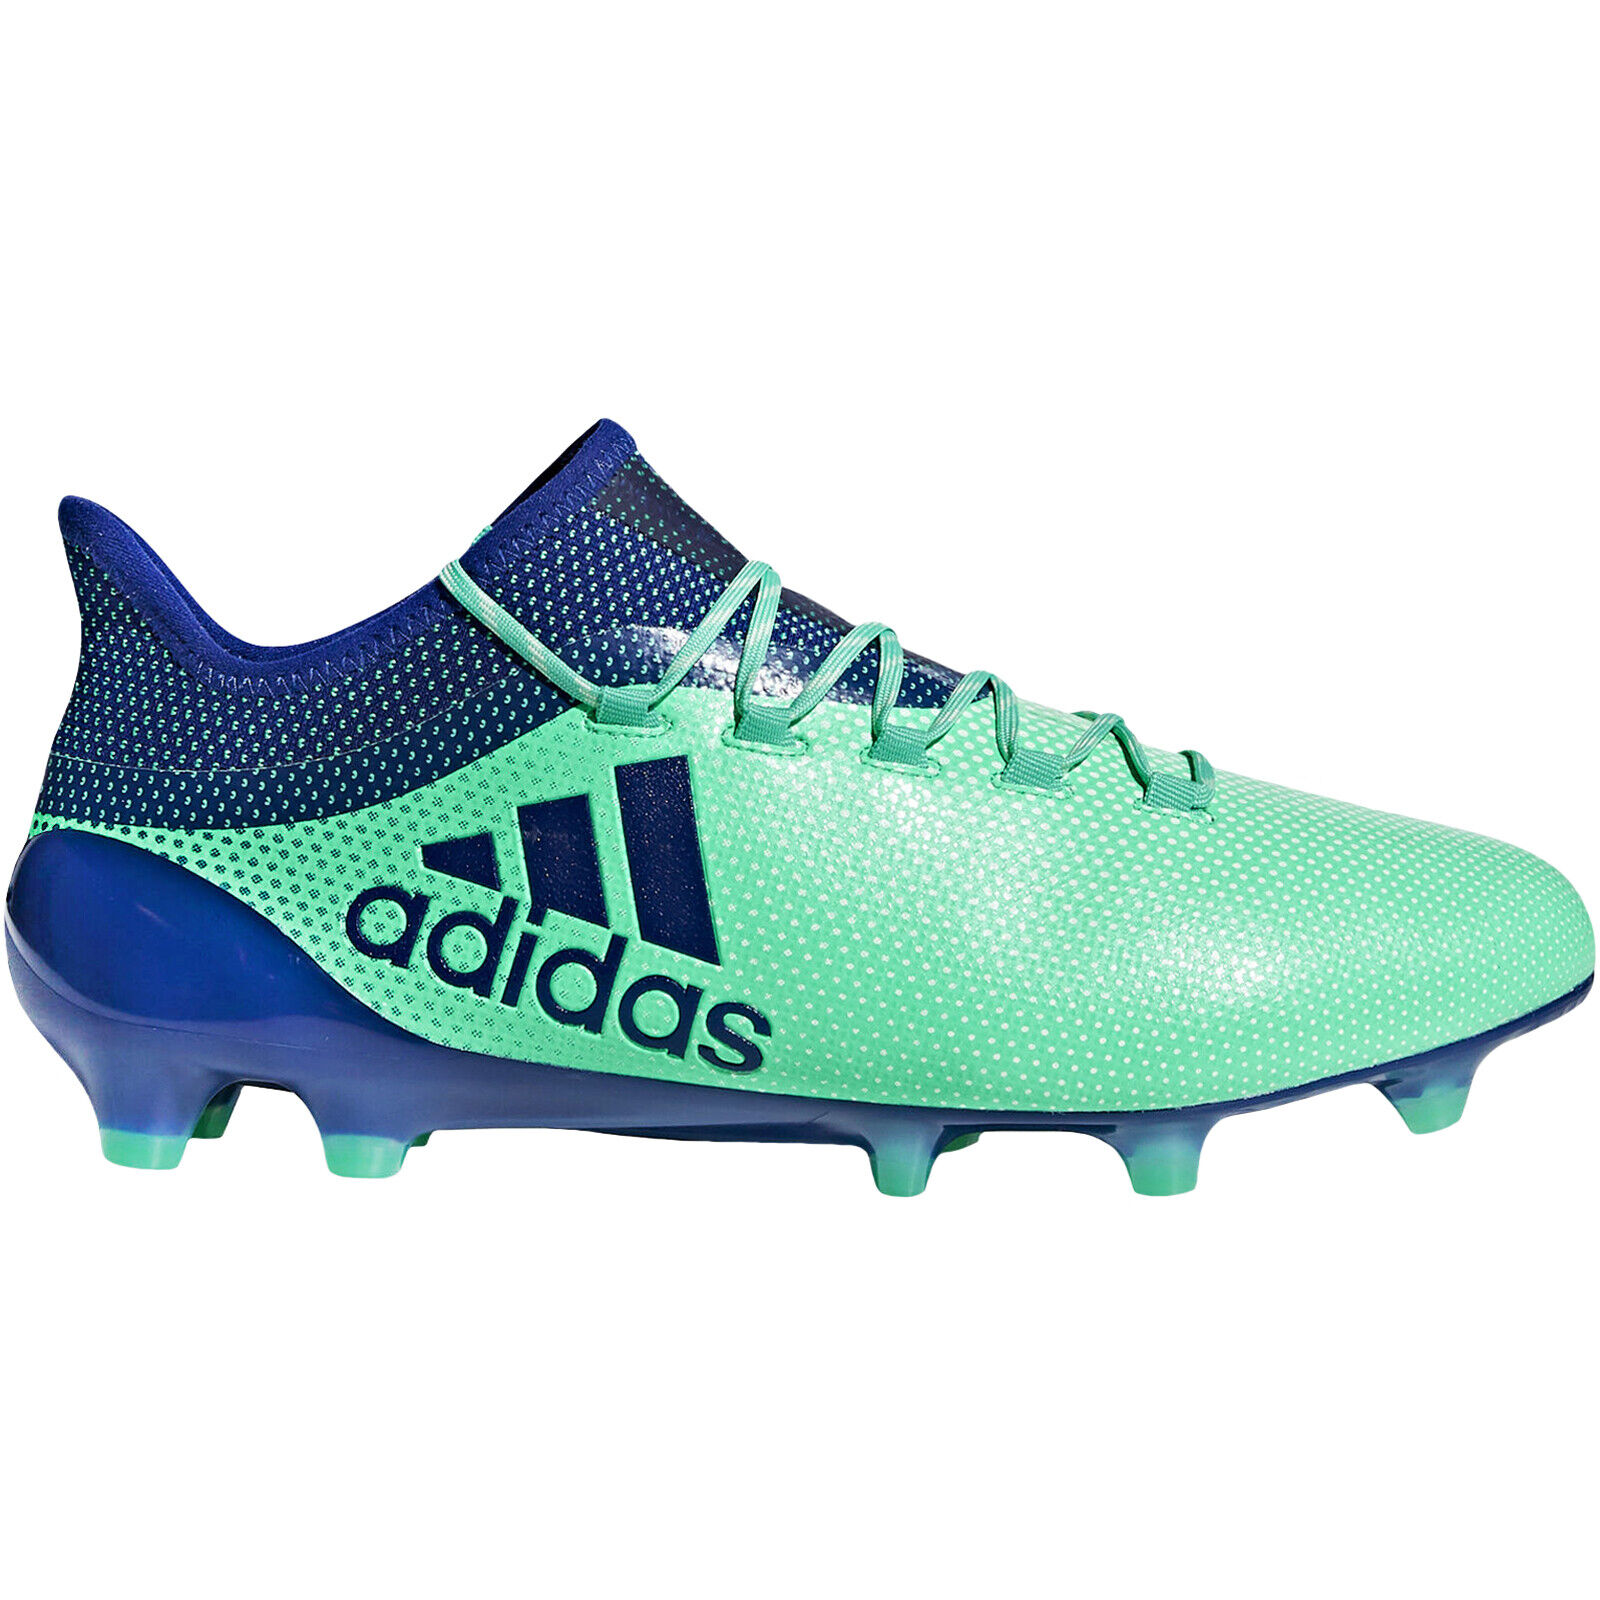 Adidas Perforuomoce Uomo x 17.1 Firm Firm Firm Ground Sports tuttienamento Footbtutti Stivali - 8ad